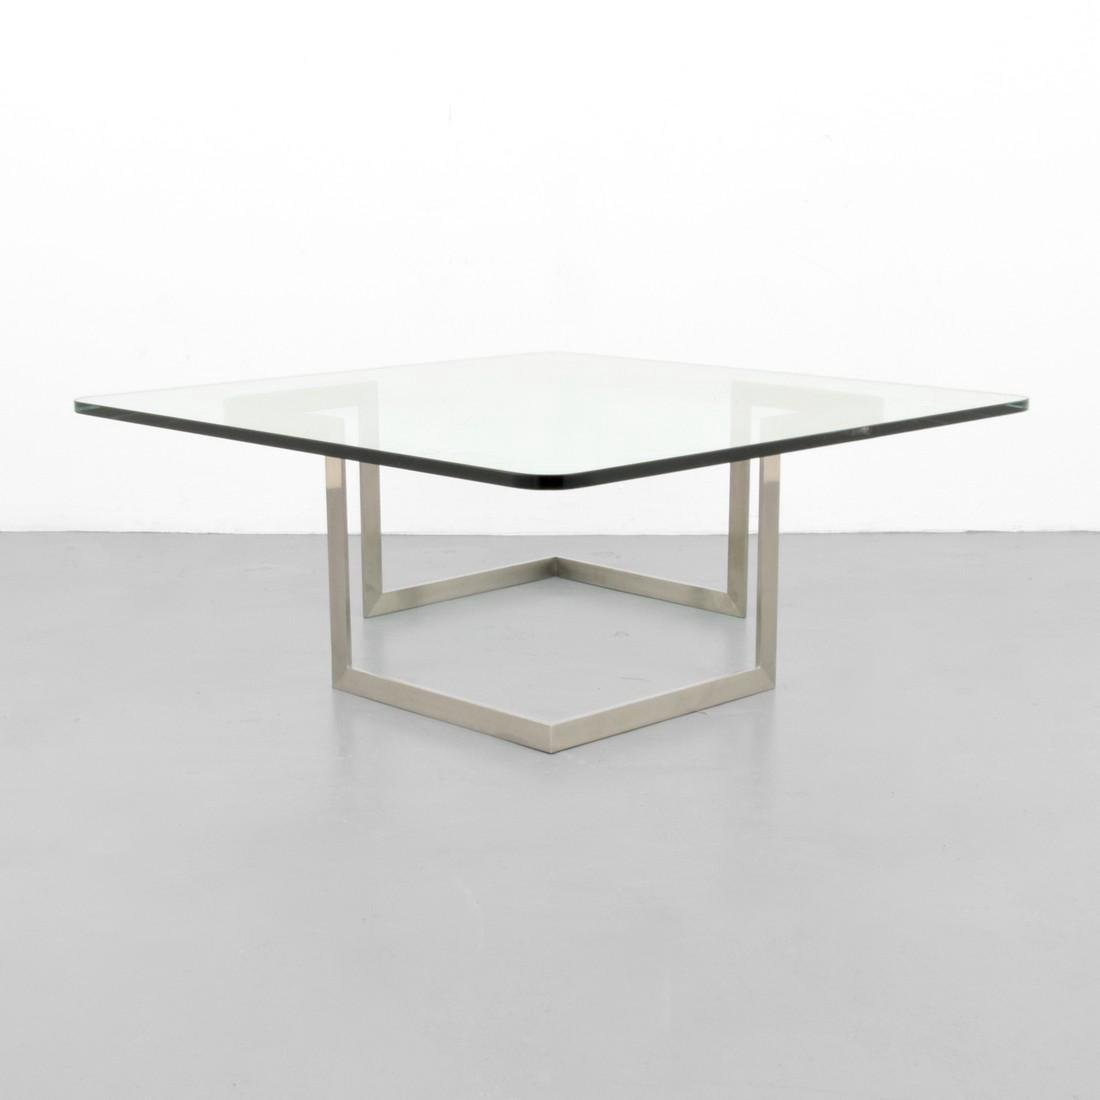 Vladimir Kagan INFINITY Coffee Table